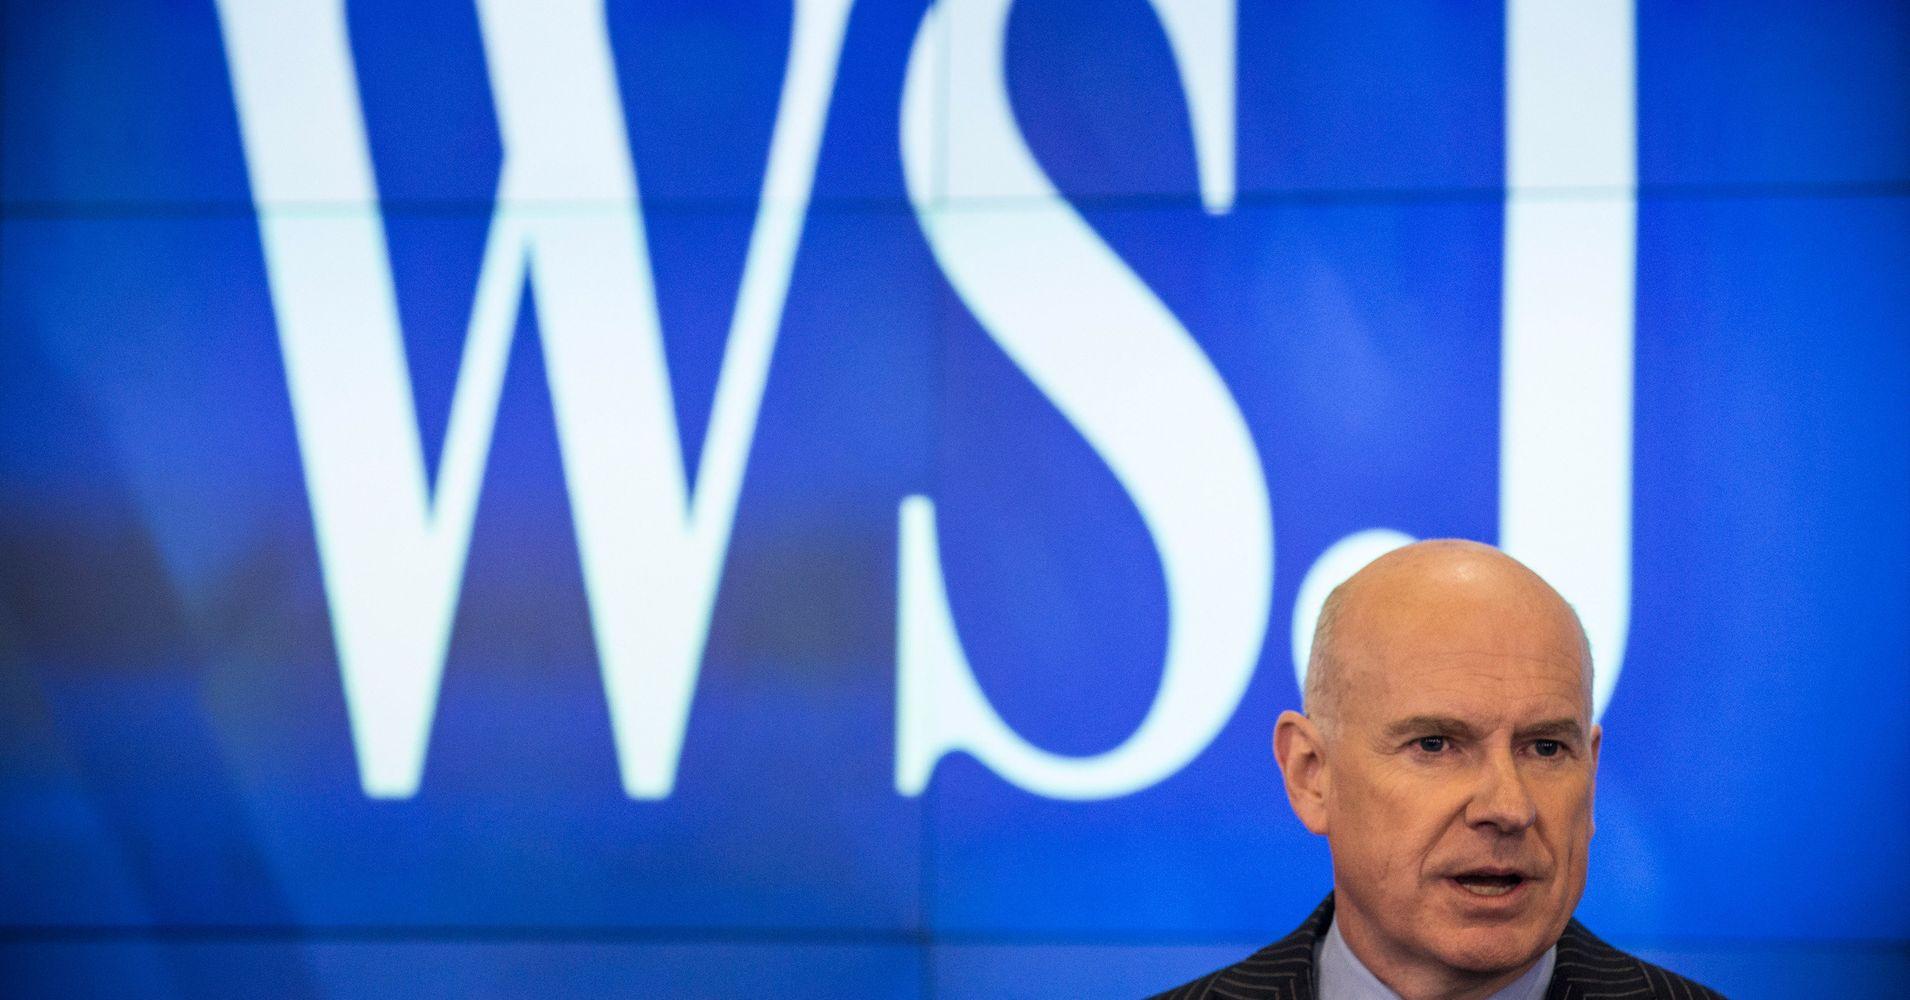 Wall Street Journal Reporters Demand Action On Newsroom Diversity